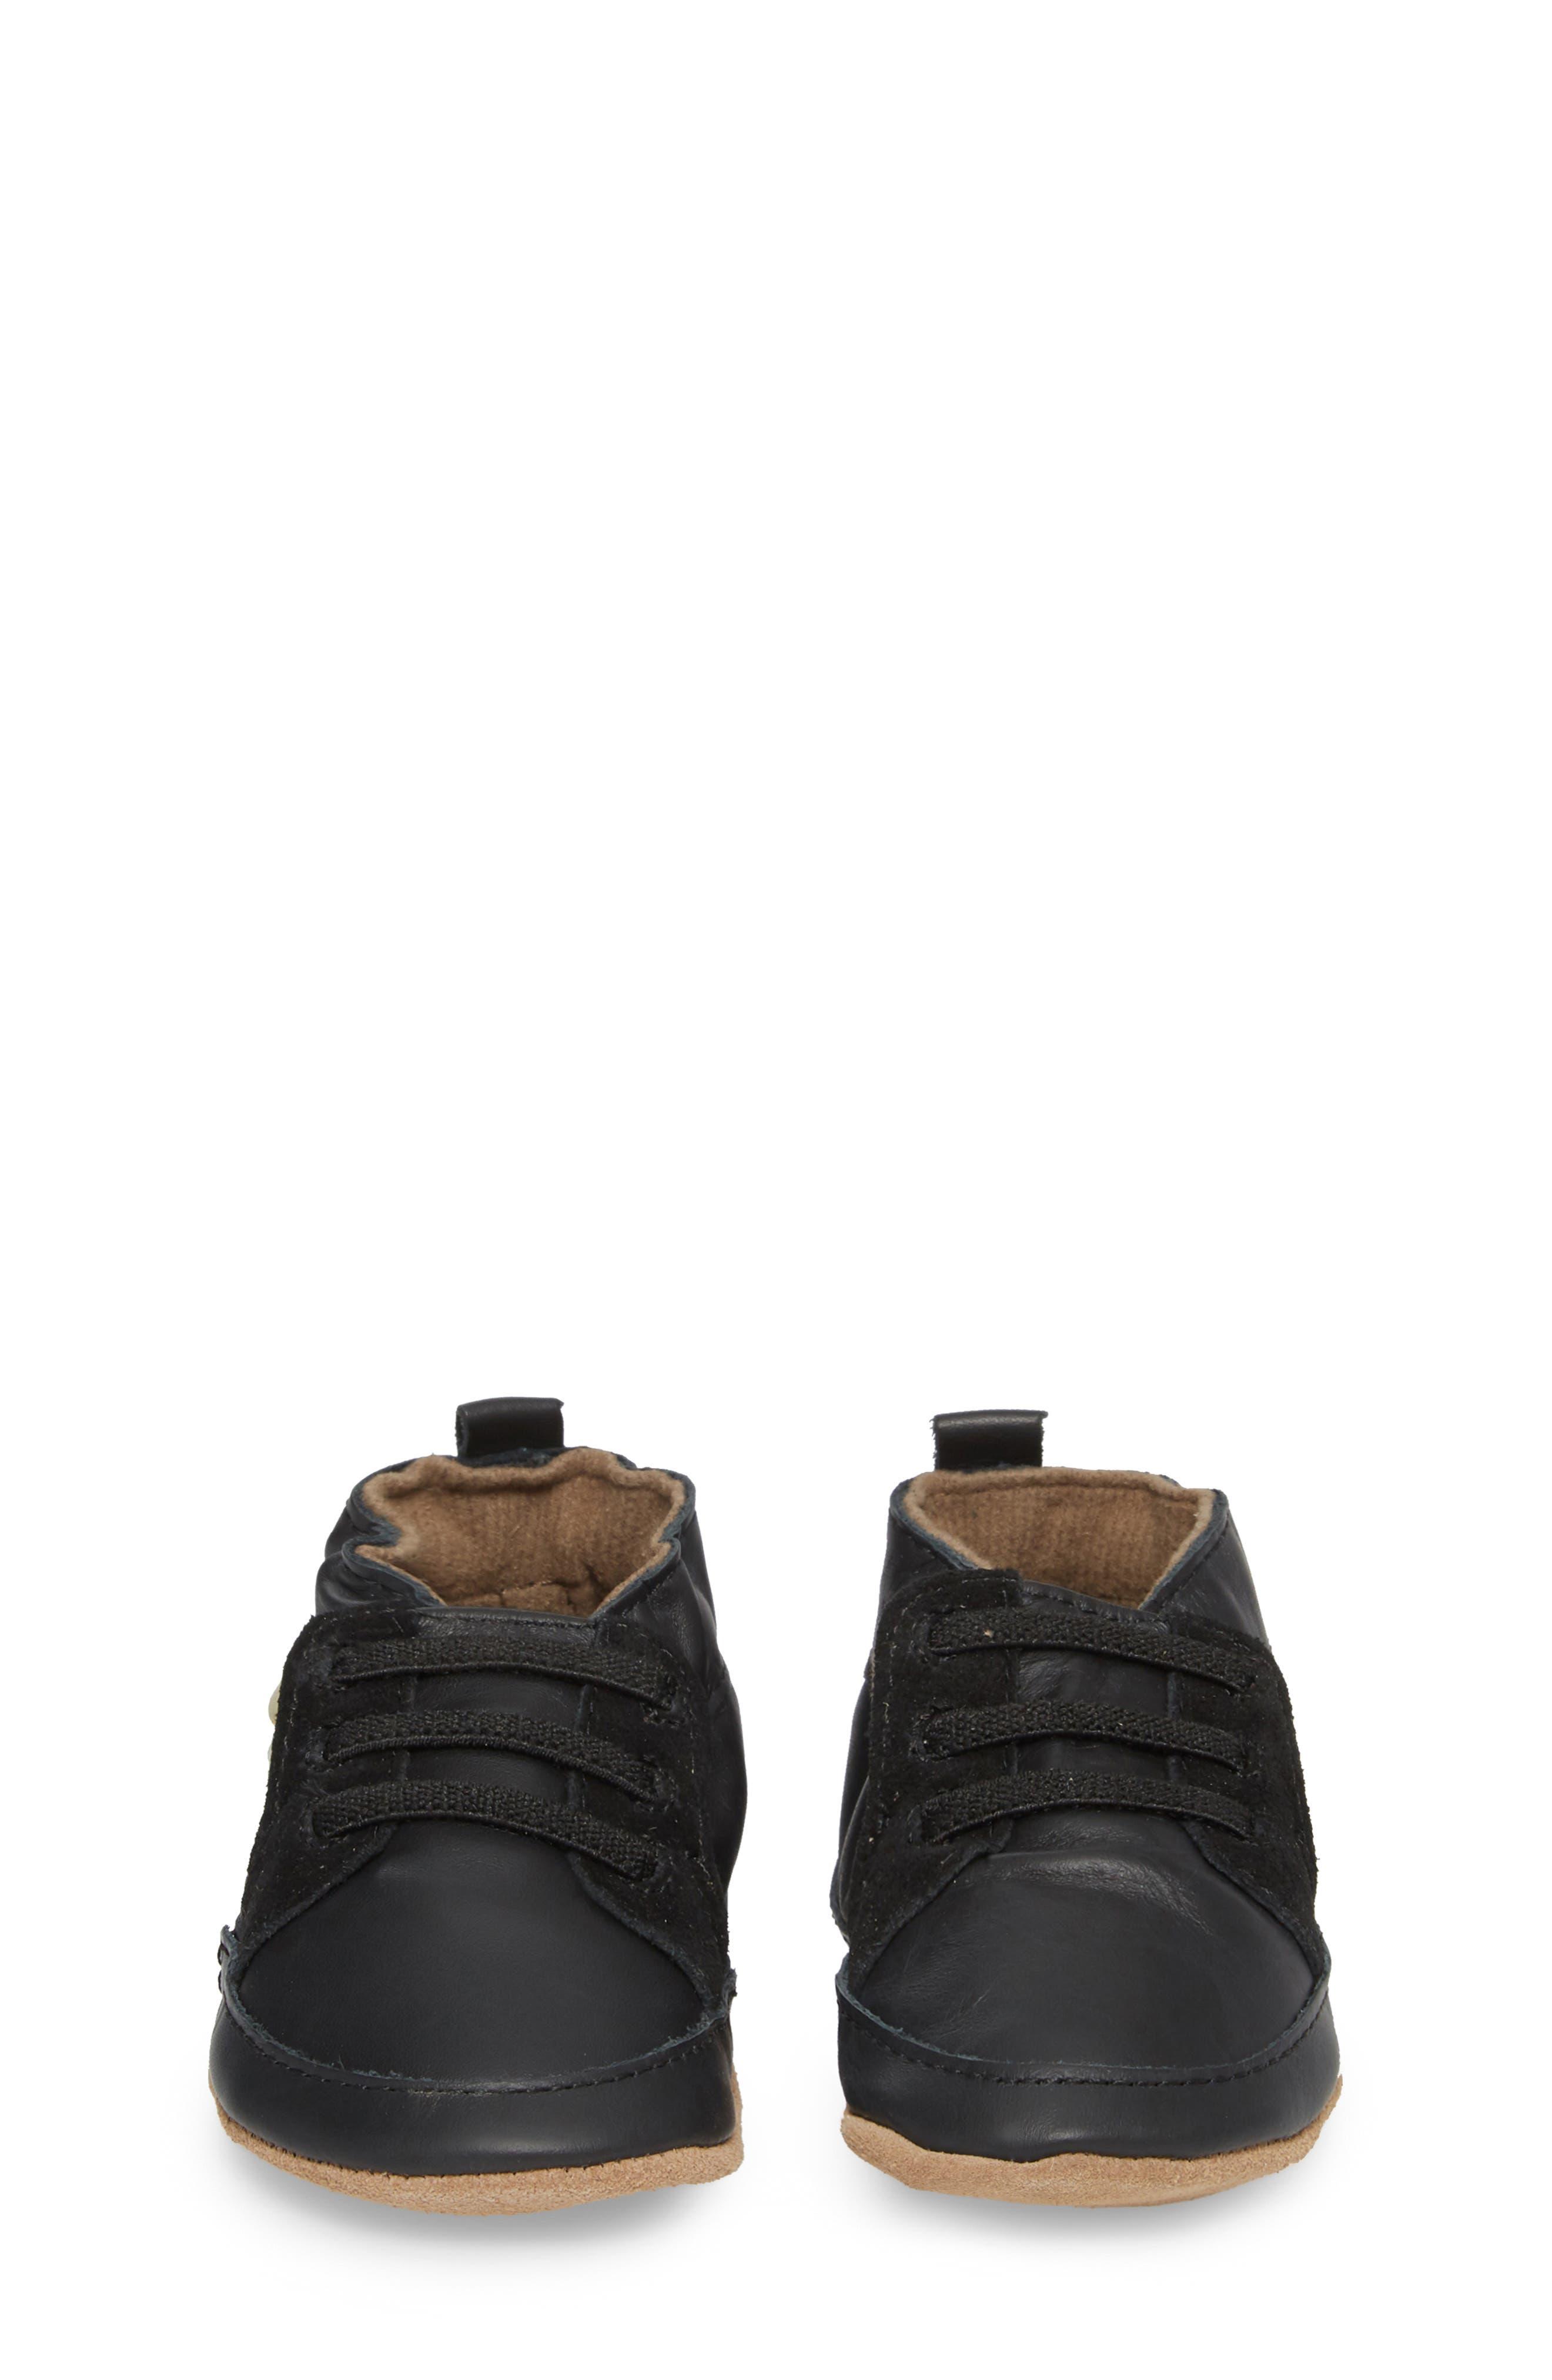 Super Sporty Sneaker Crib Shoe,                             Alternate thumbnail 4, color,                             BLACK